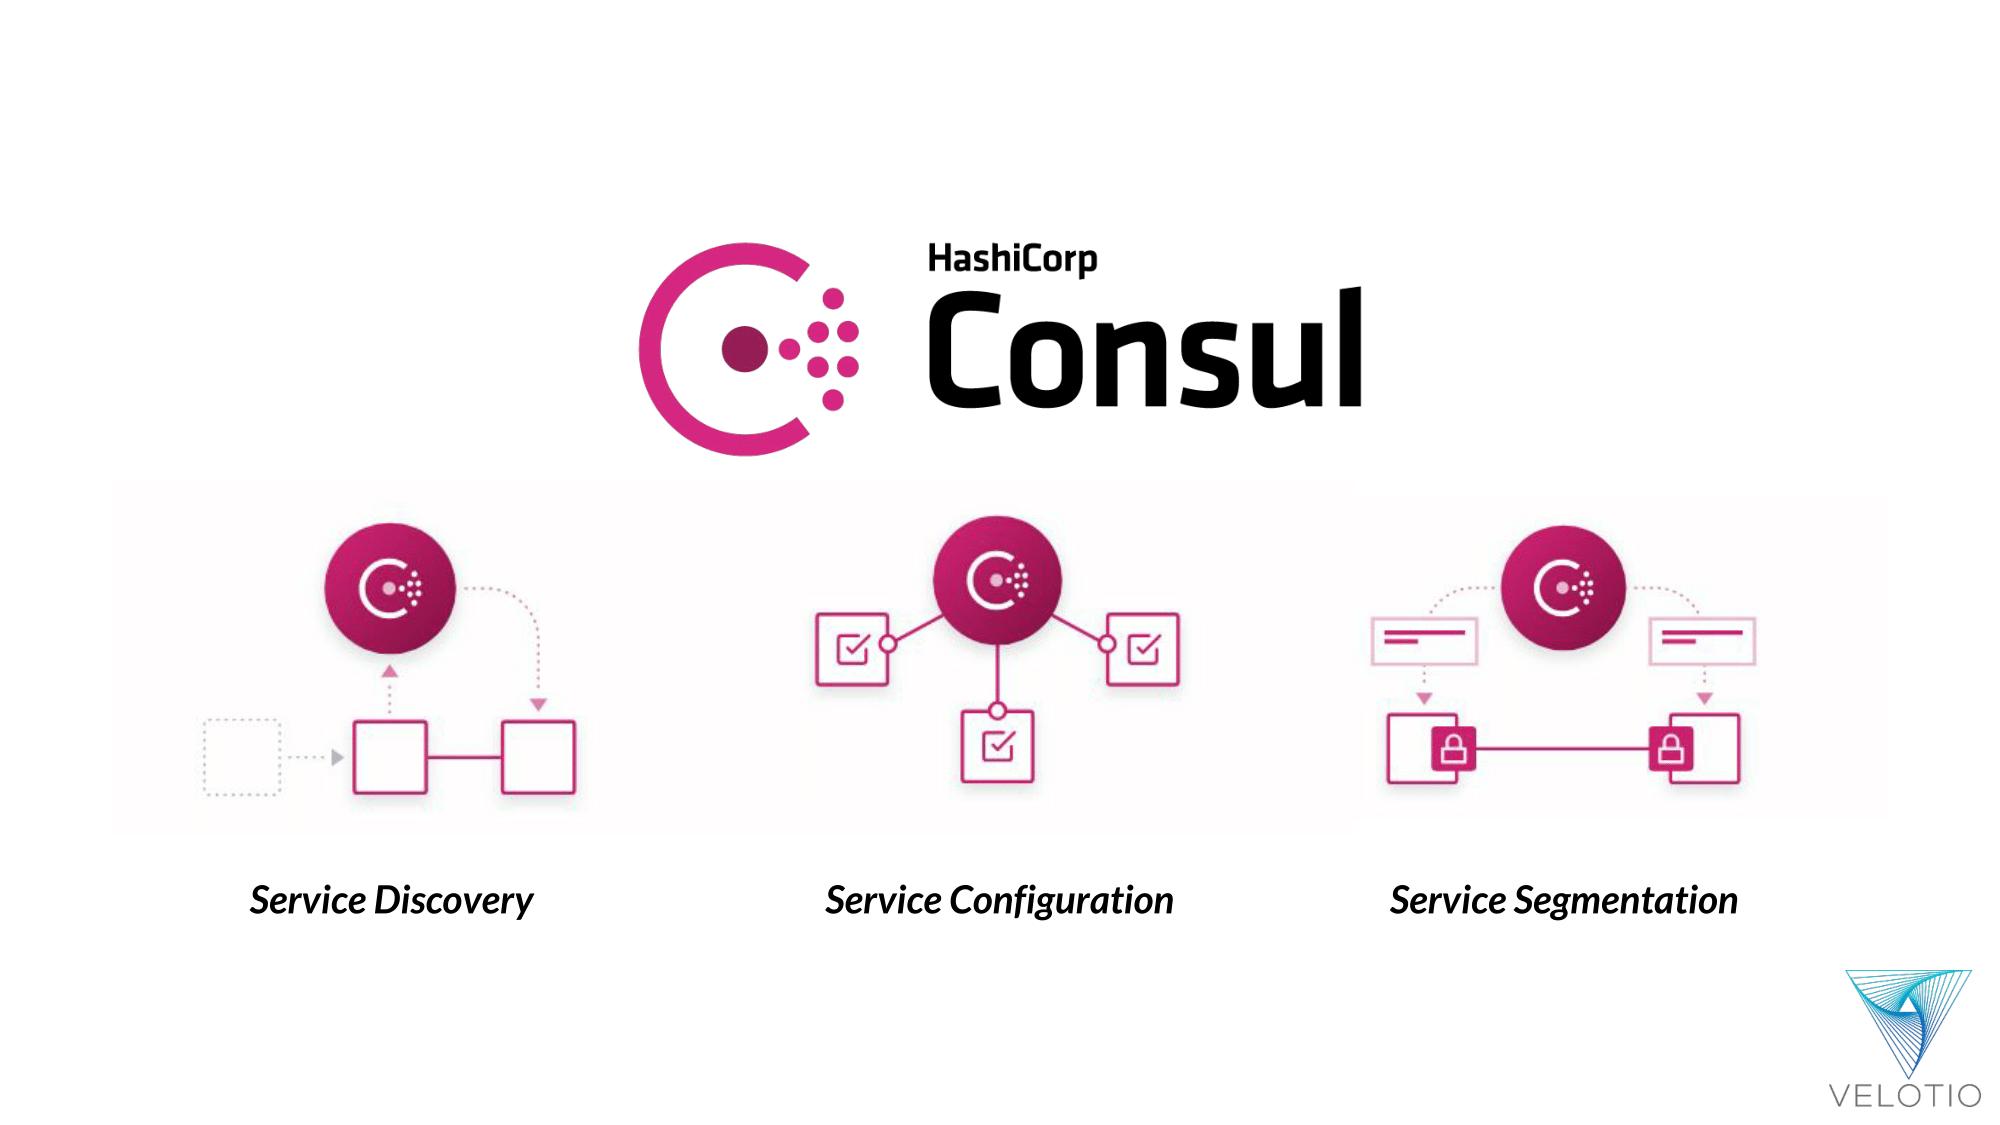 HashiCorp Consul